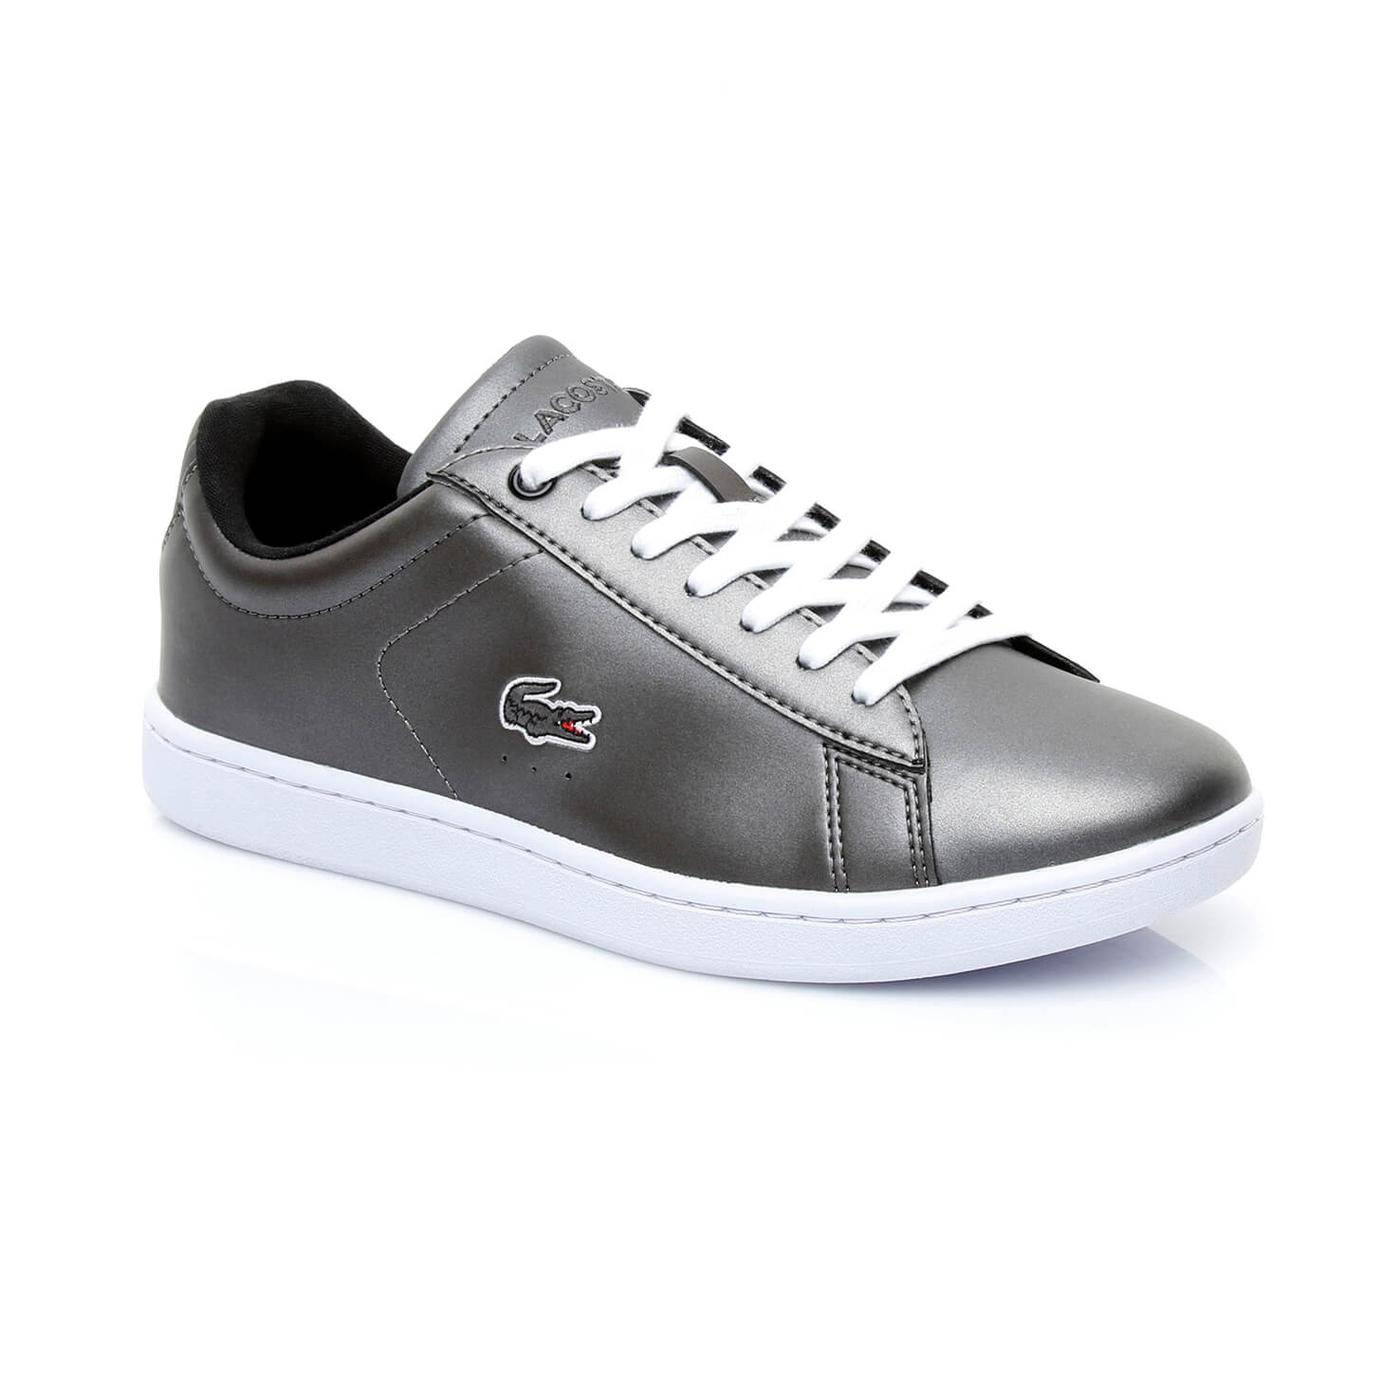 Lacoste Carnaby Evo Kadın Parlak Siyah Sneaker